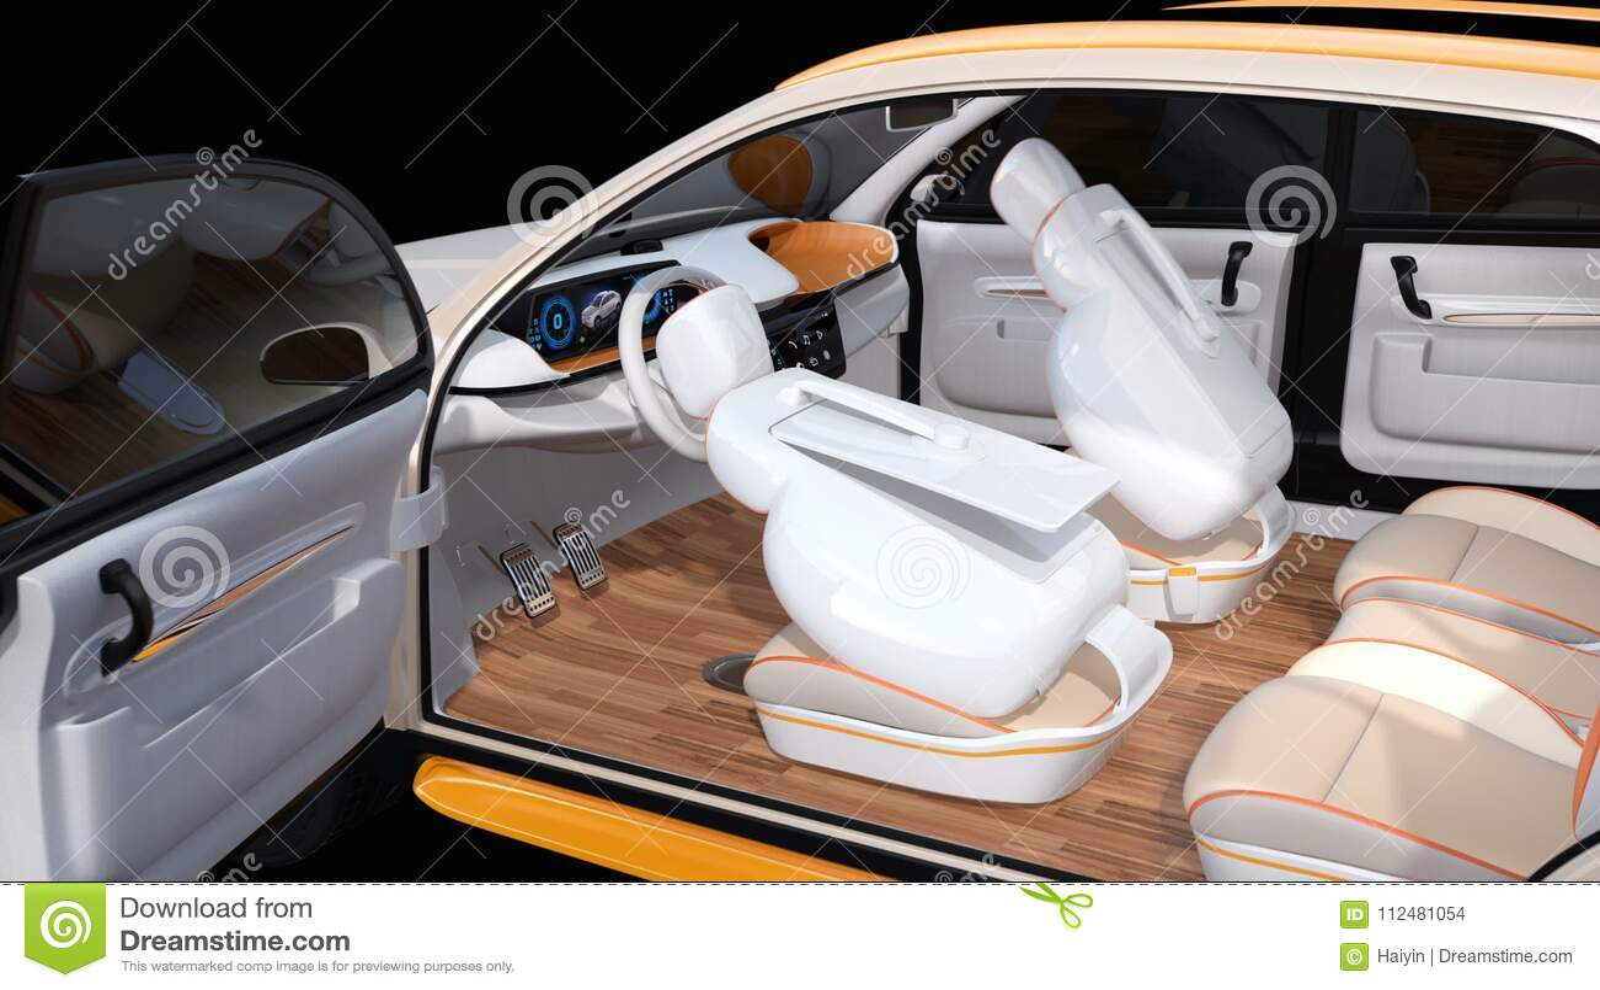 Electric self driving suv car interior design stock footage video electric self driving suv car interior design stock footage video of auto digital 112481054 solutioingenieria Choice Image